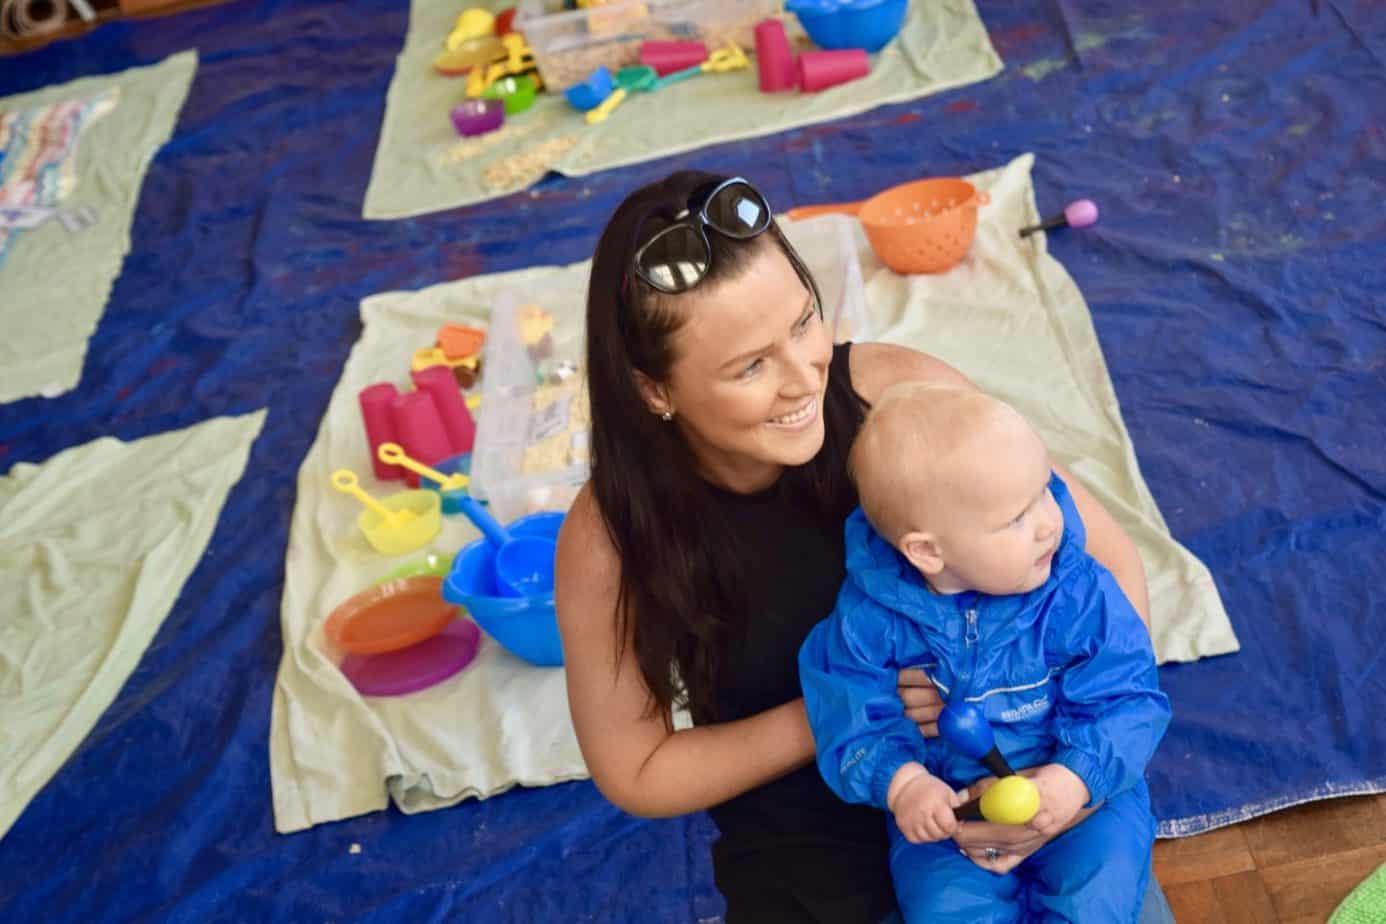 Baby K and I enjoying some circle time at Arty Splats